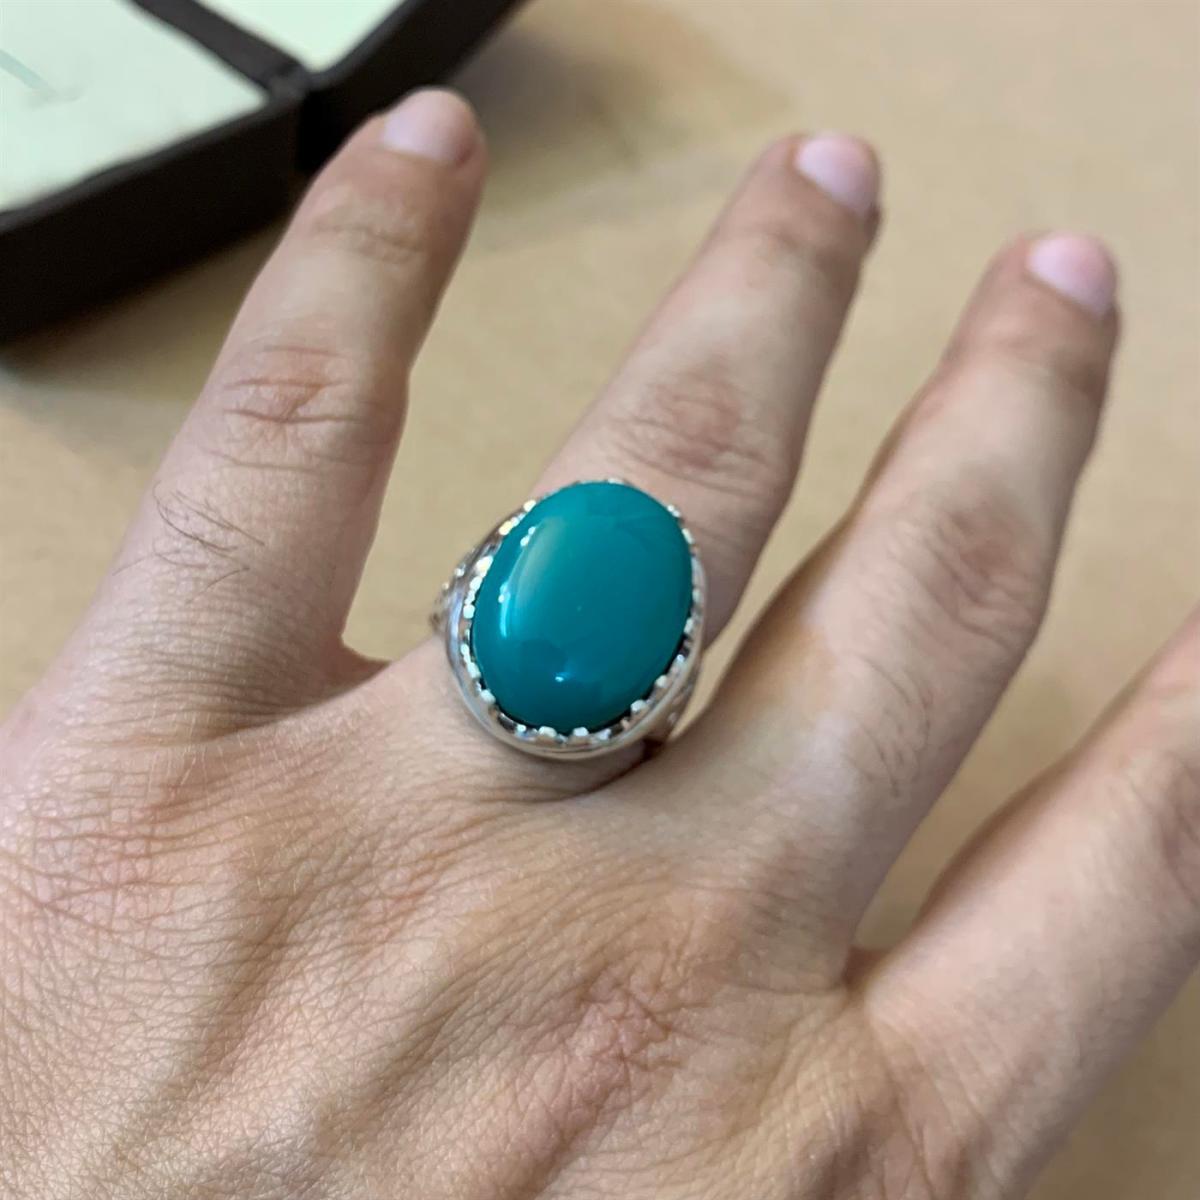 Green Hussaini Turquoise 4 natural gemstones pakistan + 925 silver jewelry online